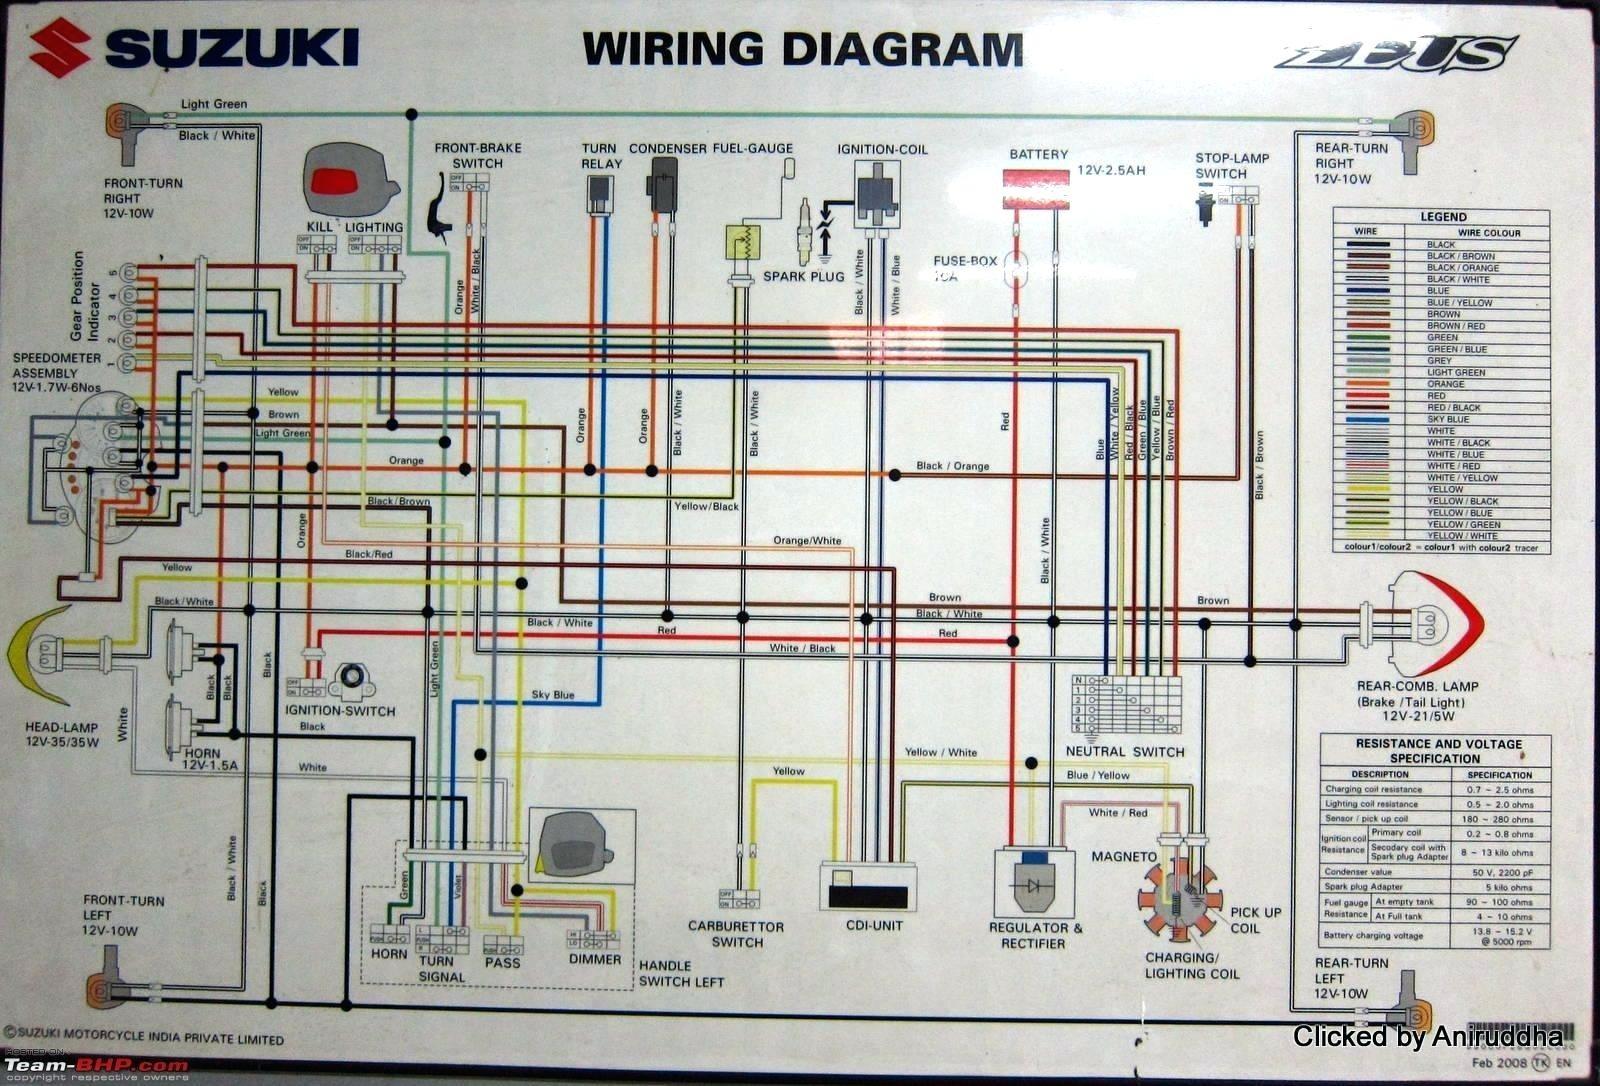 Full Size of Suzuki X4 125 Motorcycle Wiring Diagram Diagrams Two Team Schematics Heat Archived